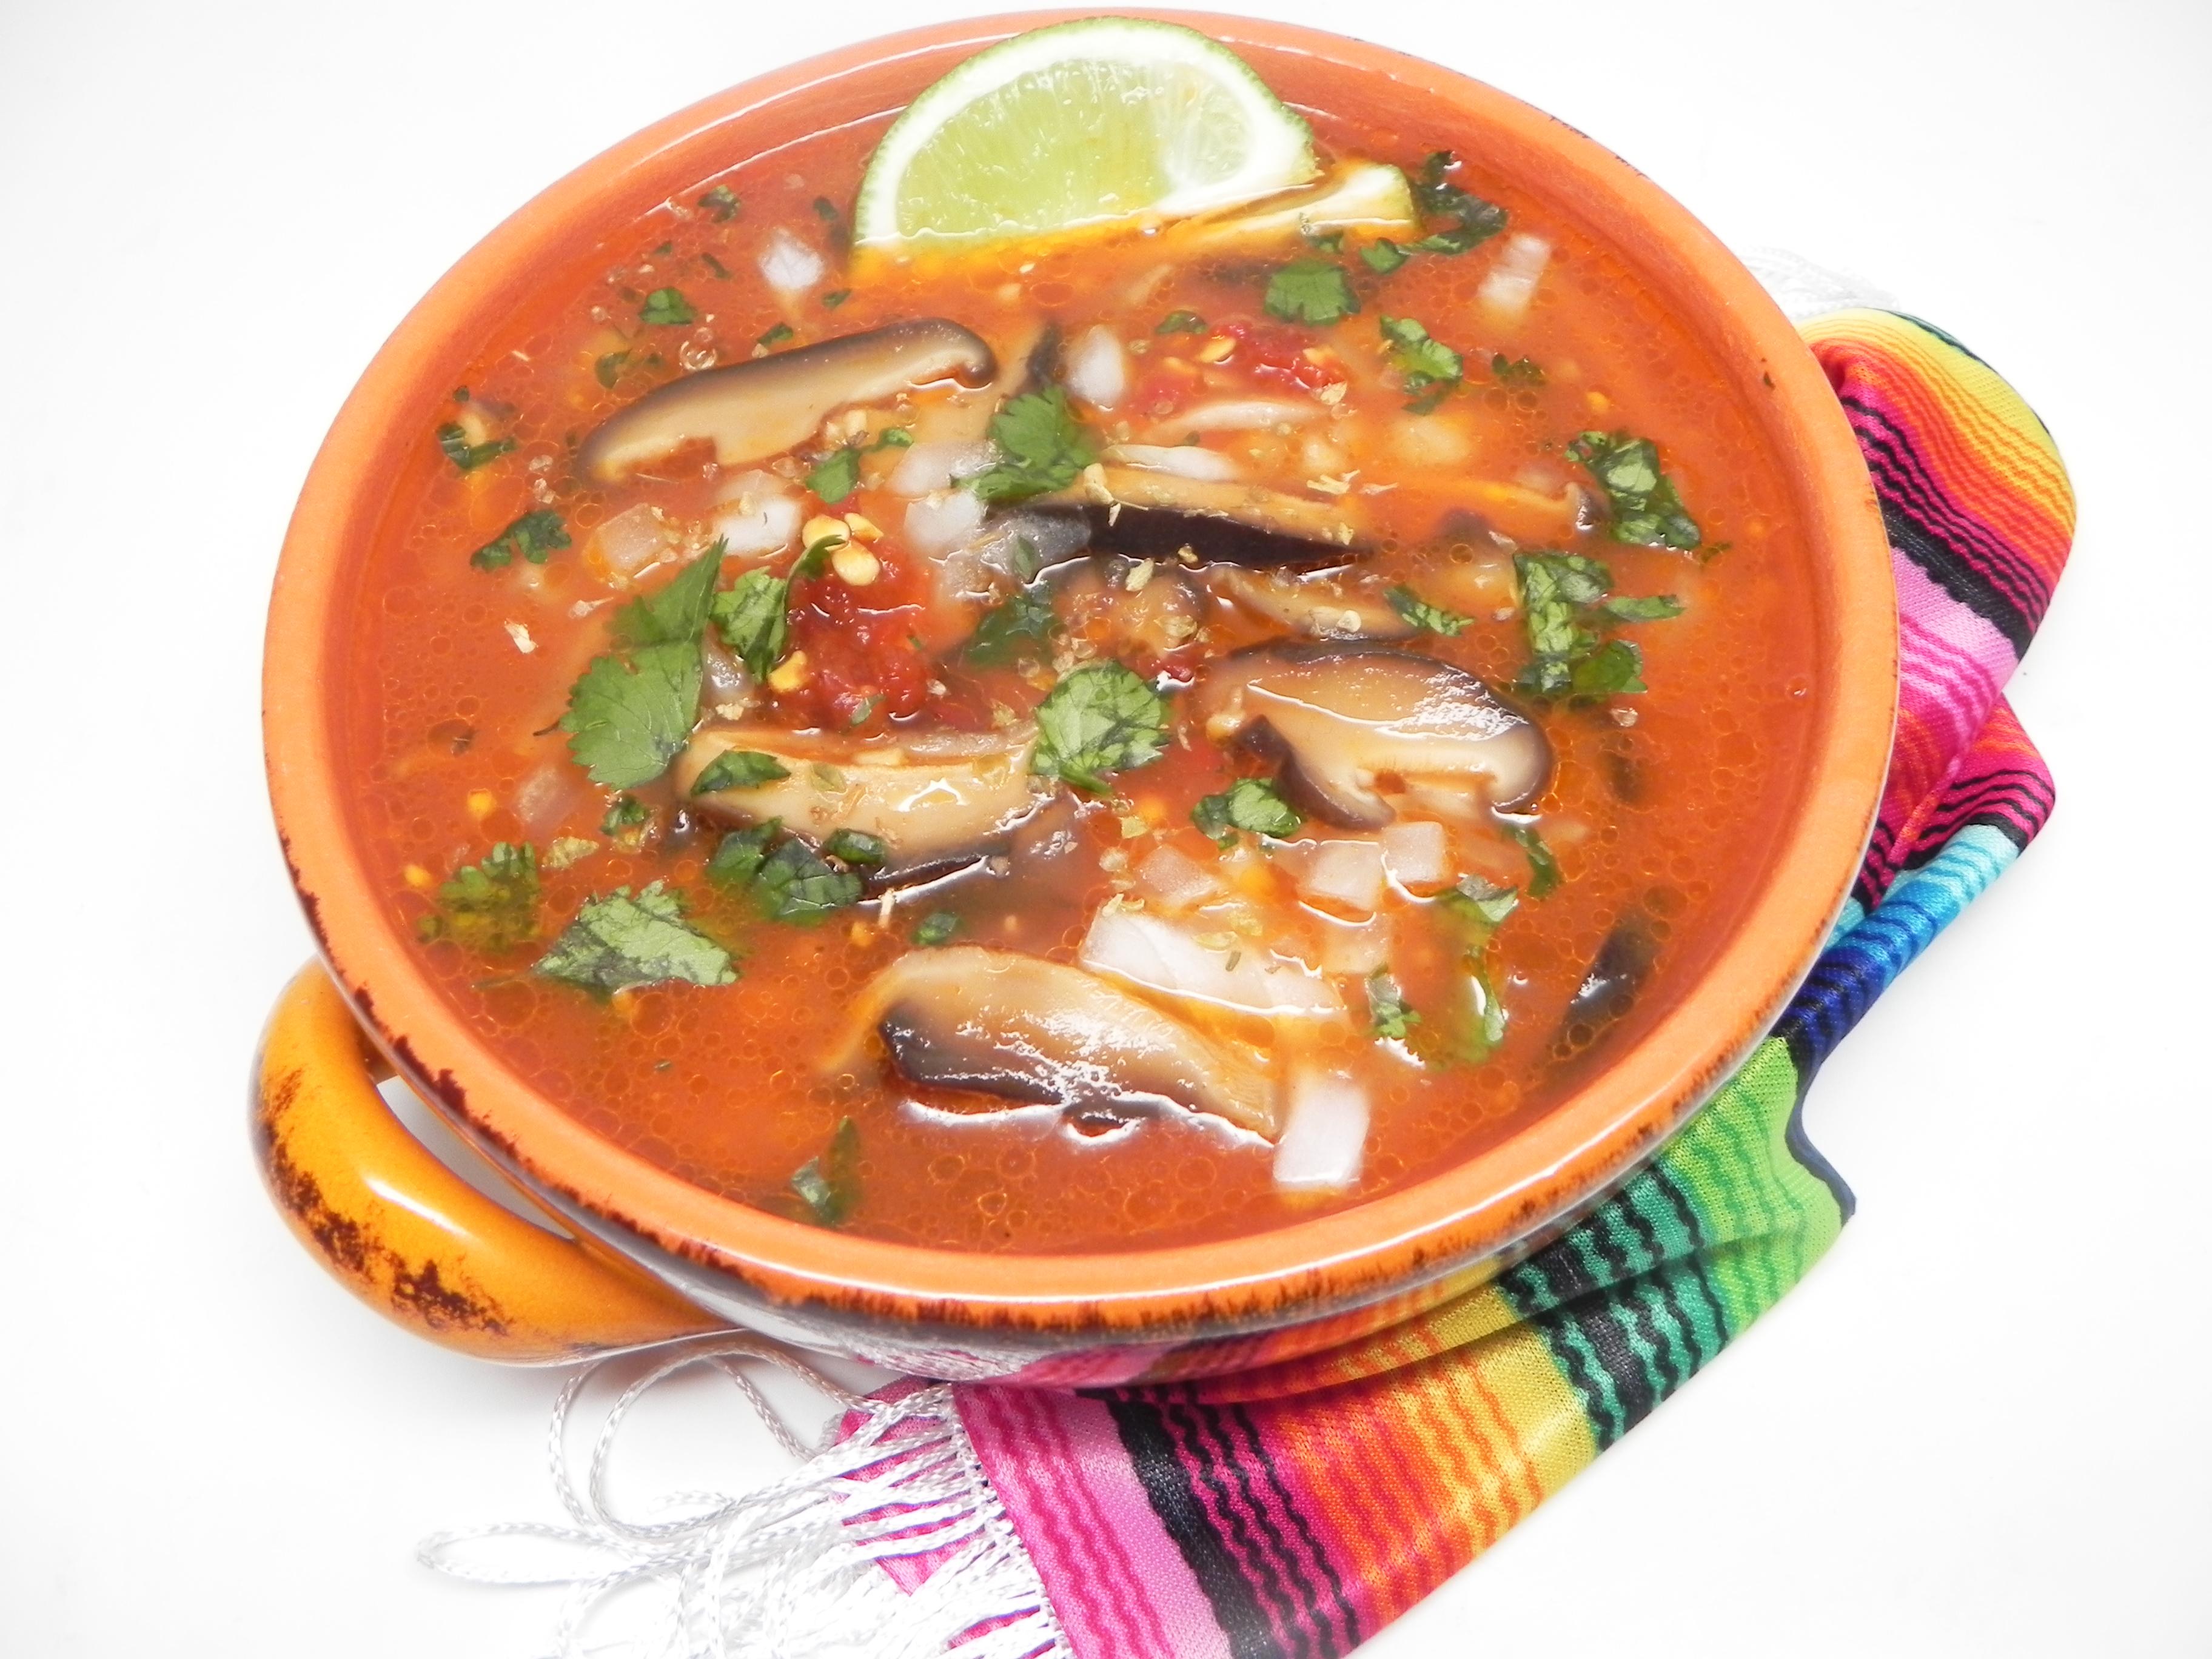 Vegan Mexican Menudo